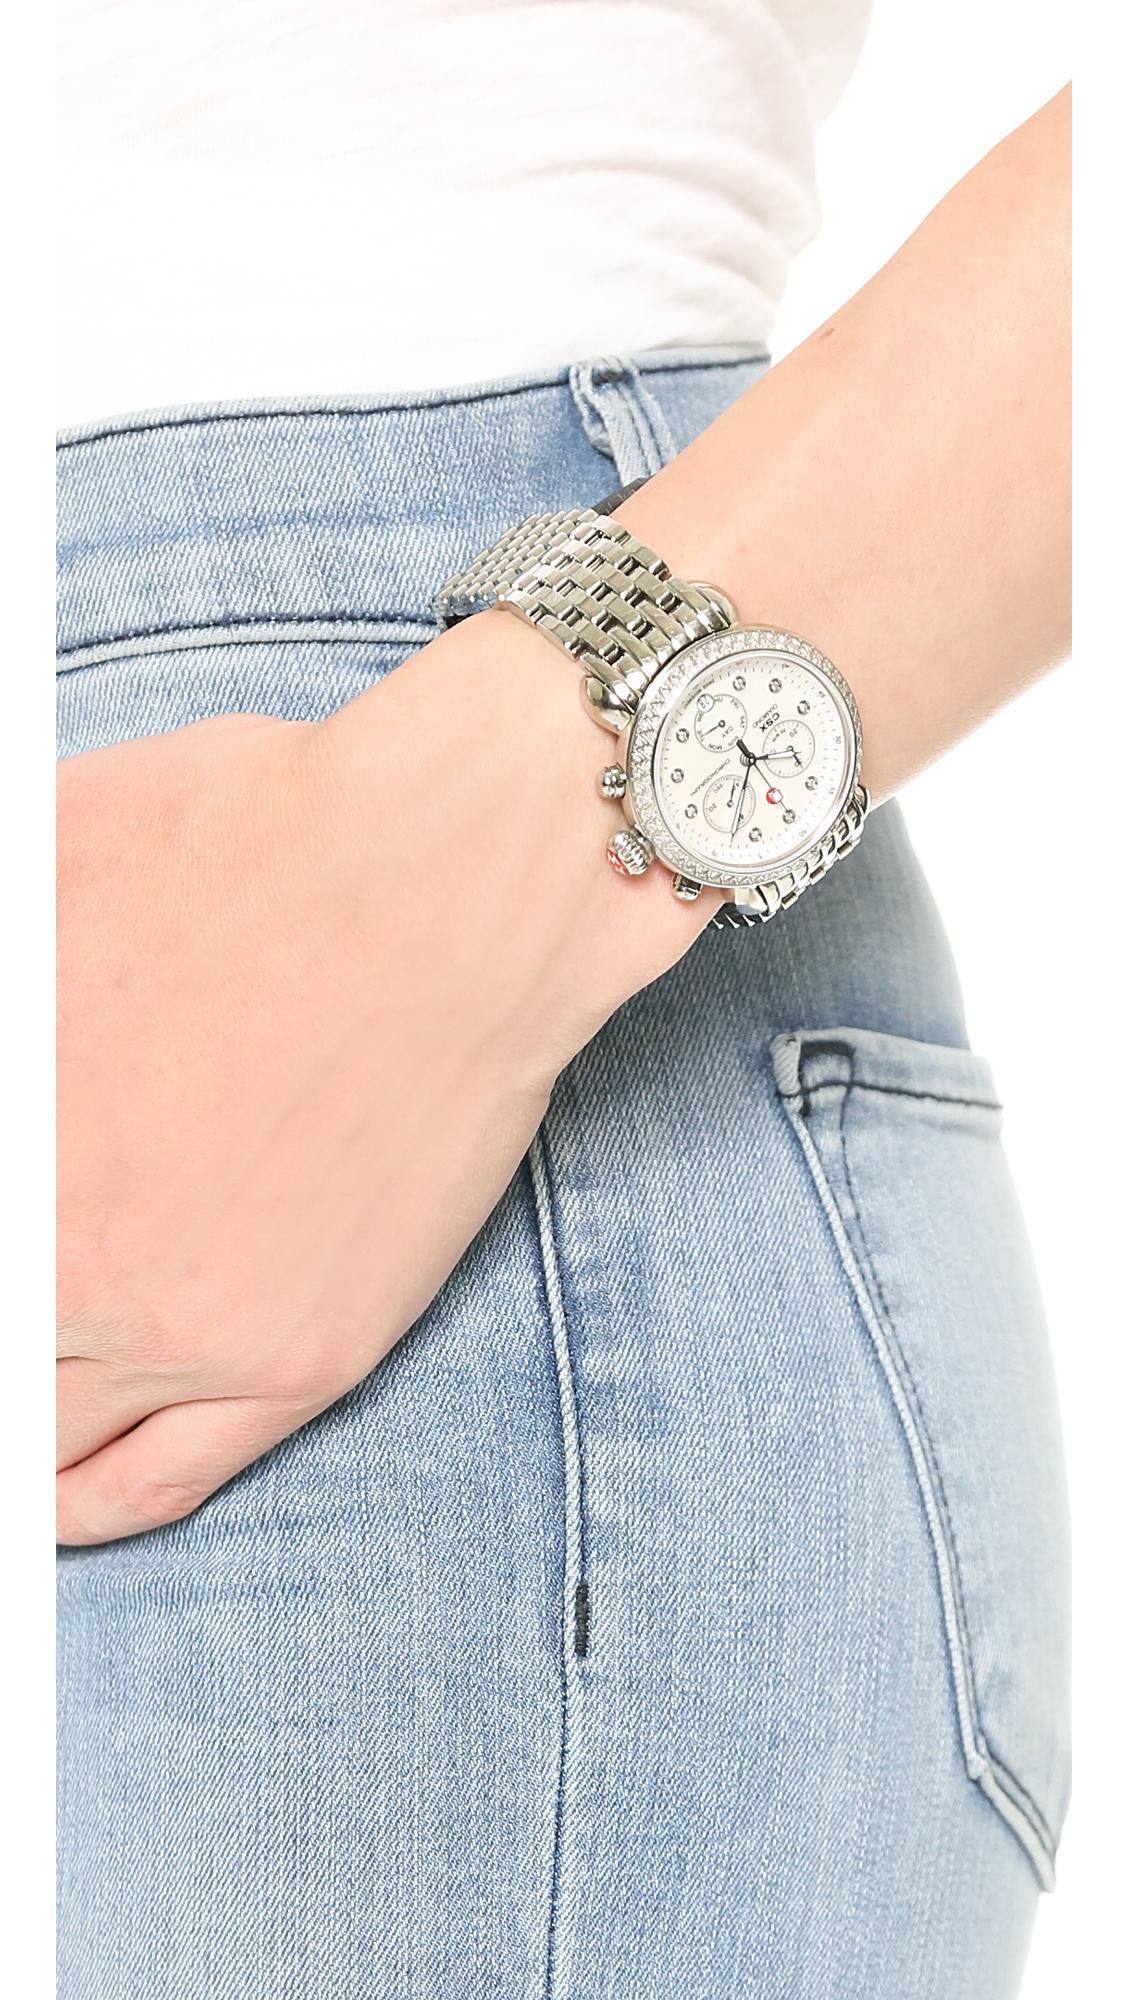 a35d8b1c8338 MICHELE CSX-36 Diamond Dial Watch